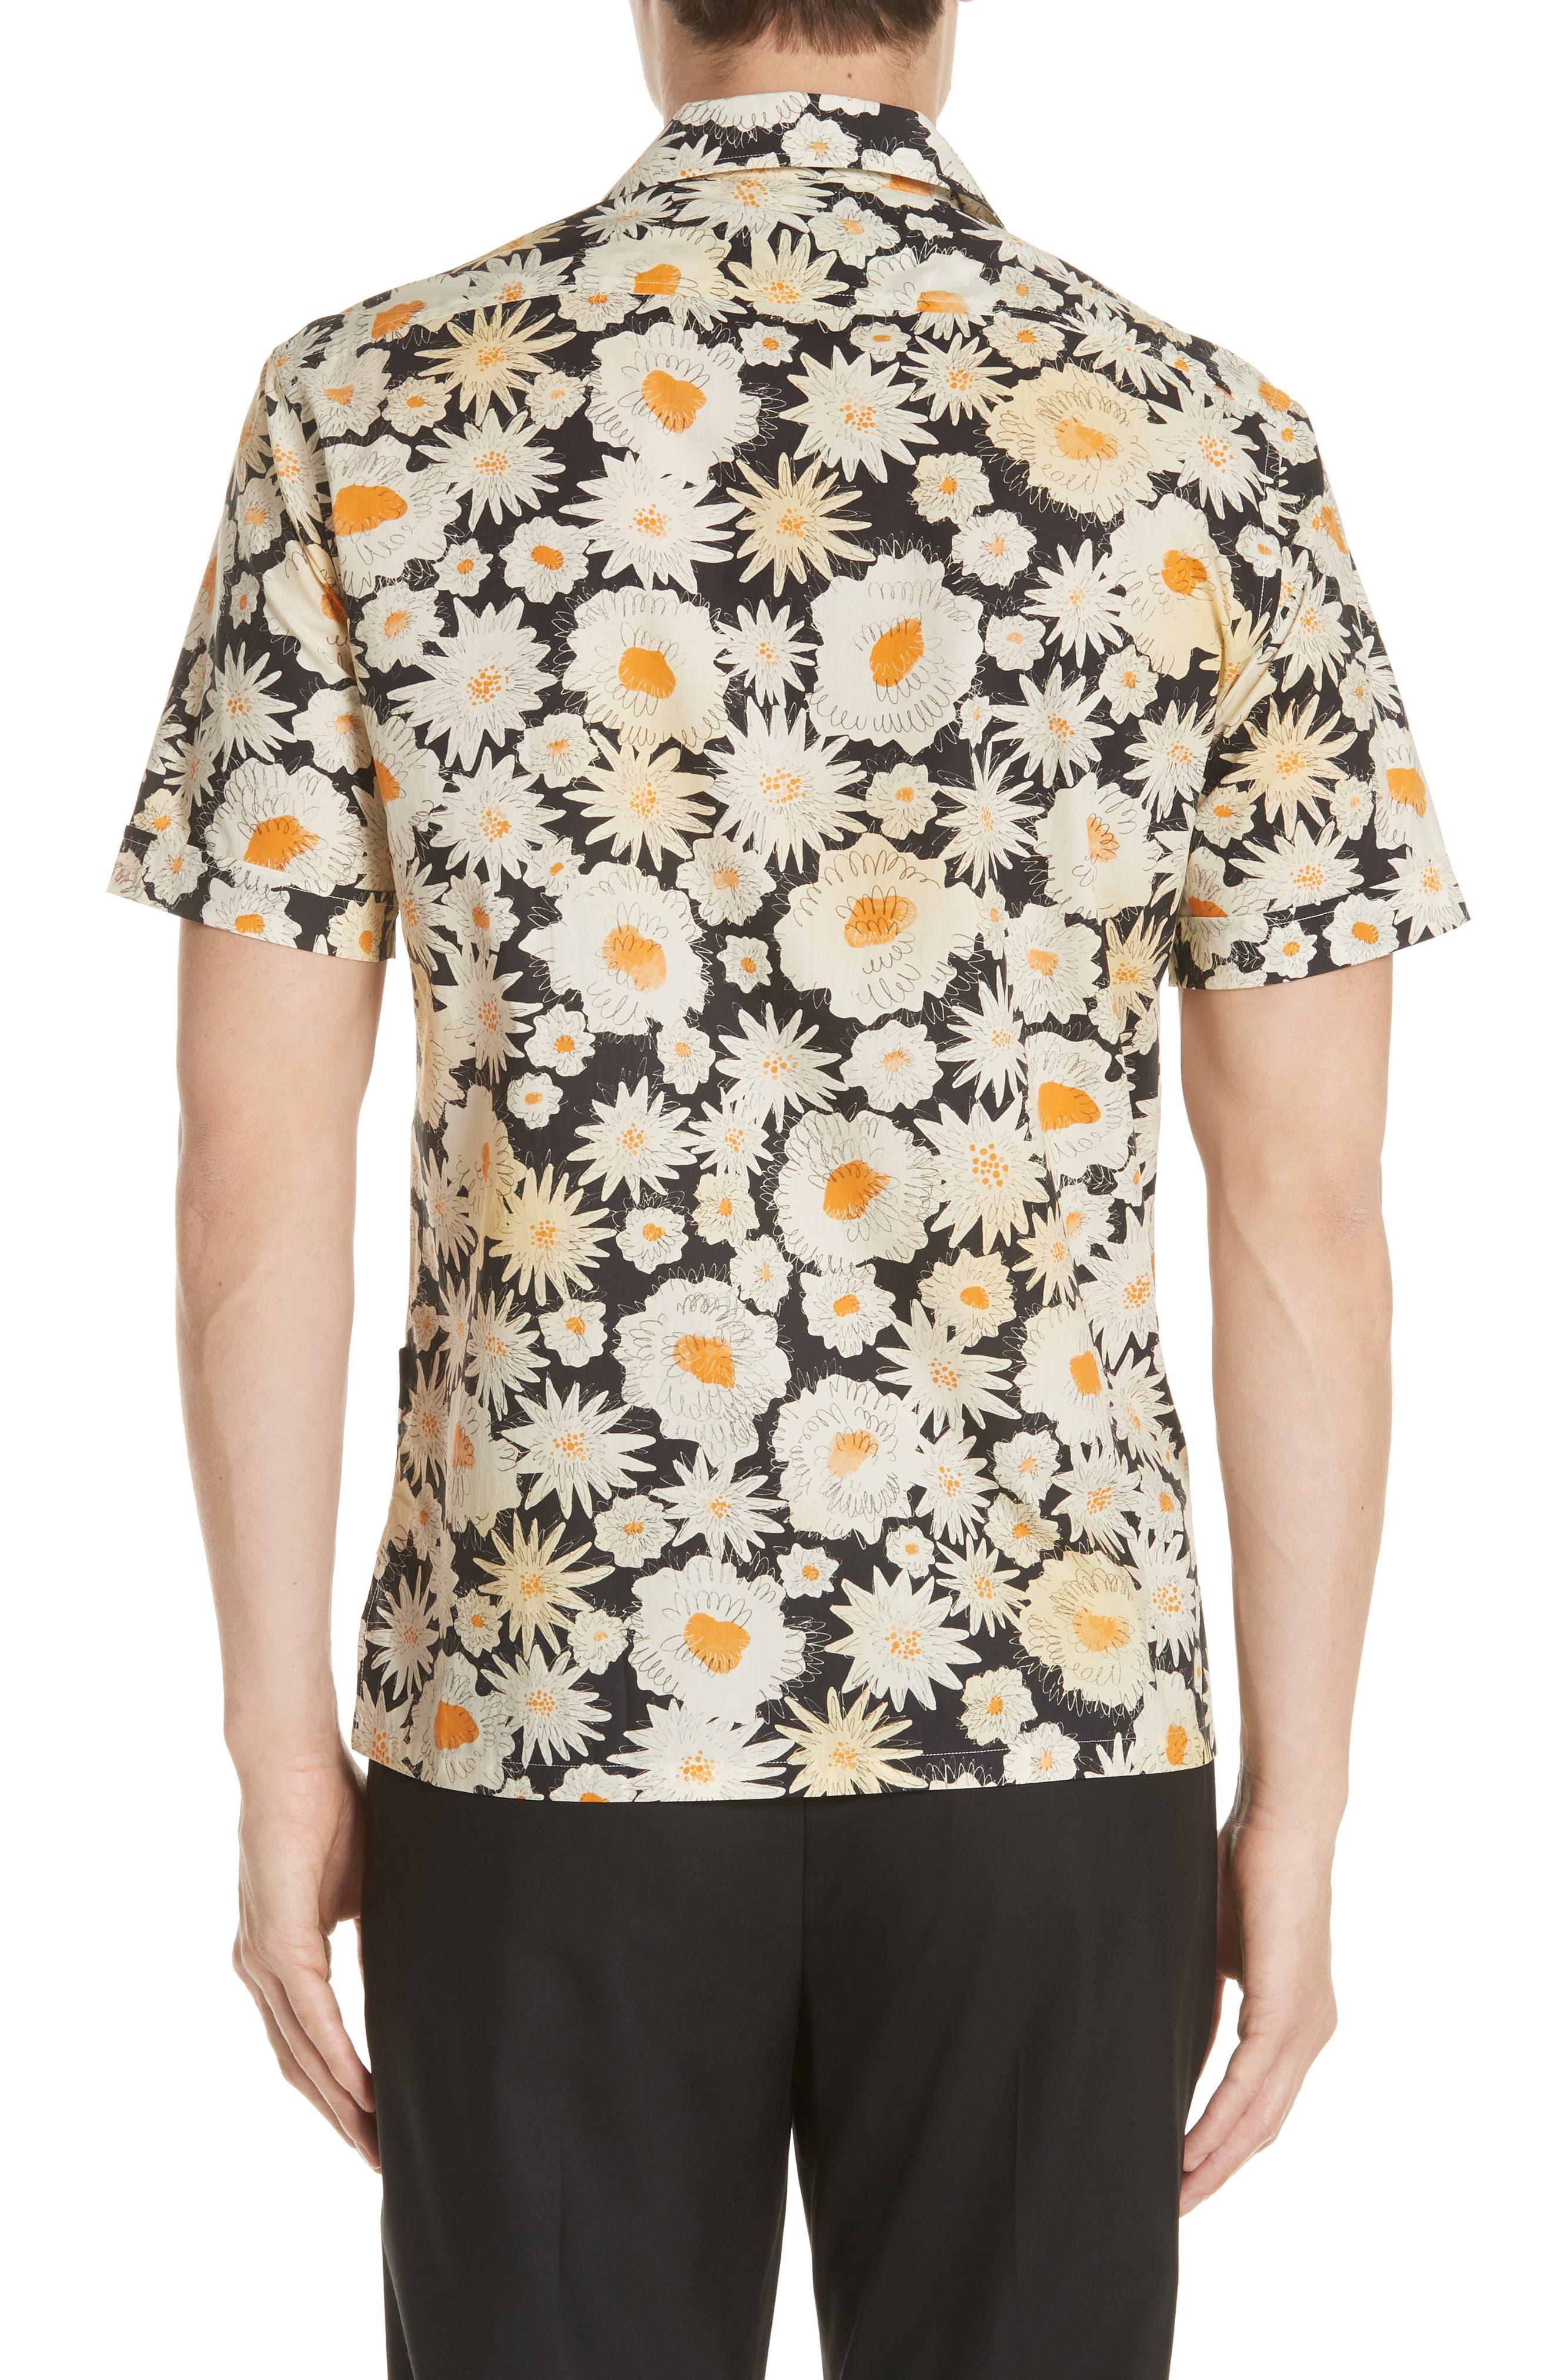 Jude Floral Print Shirt,                             Alternate thumbnail 2, color,                             001